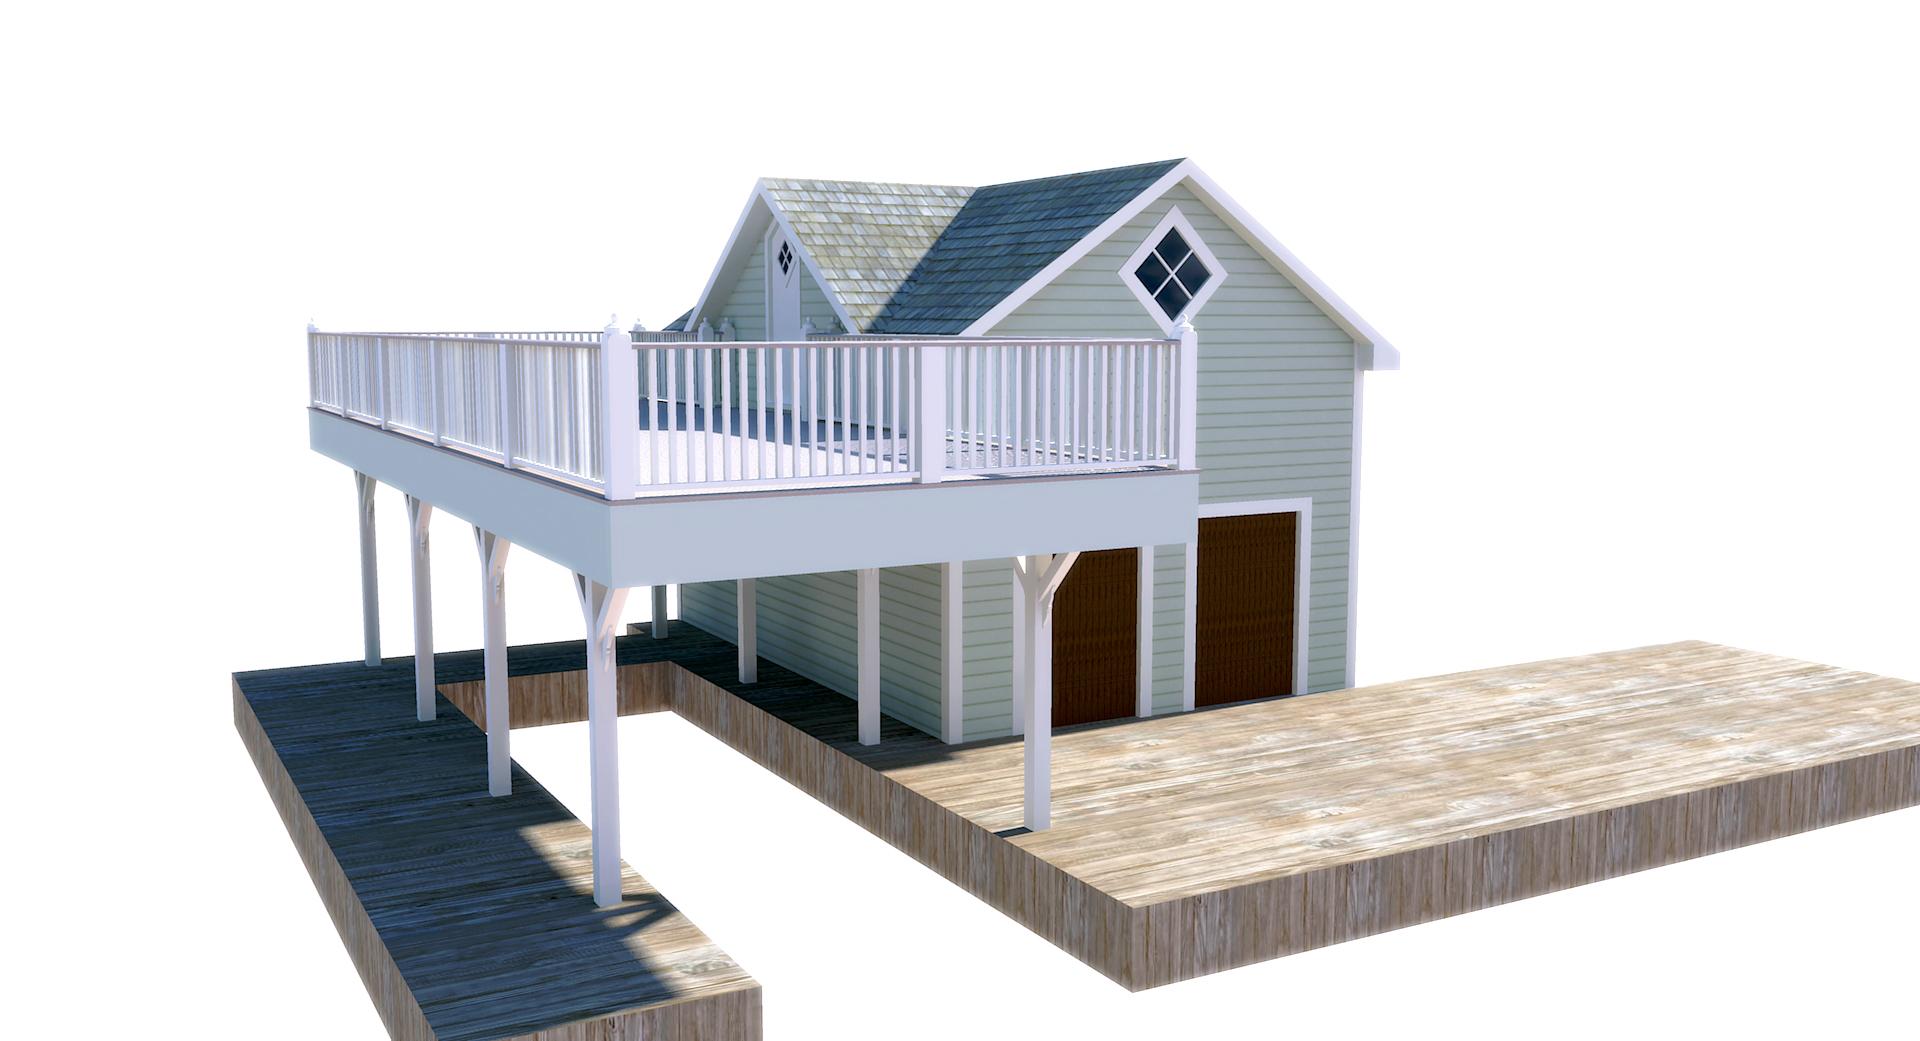 boathouse render 1.jpg